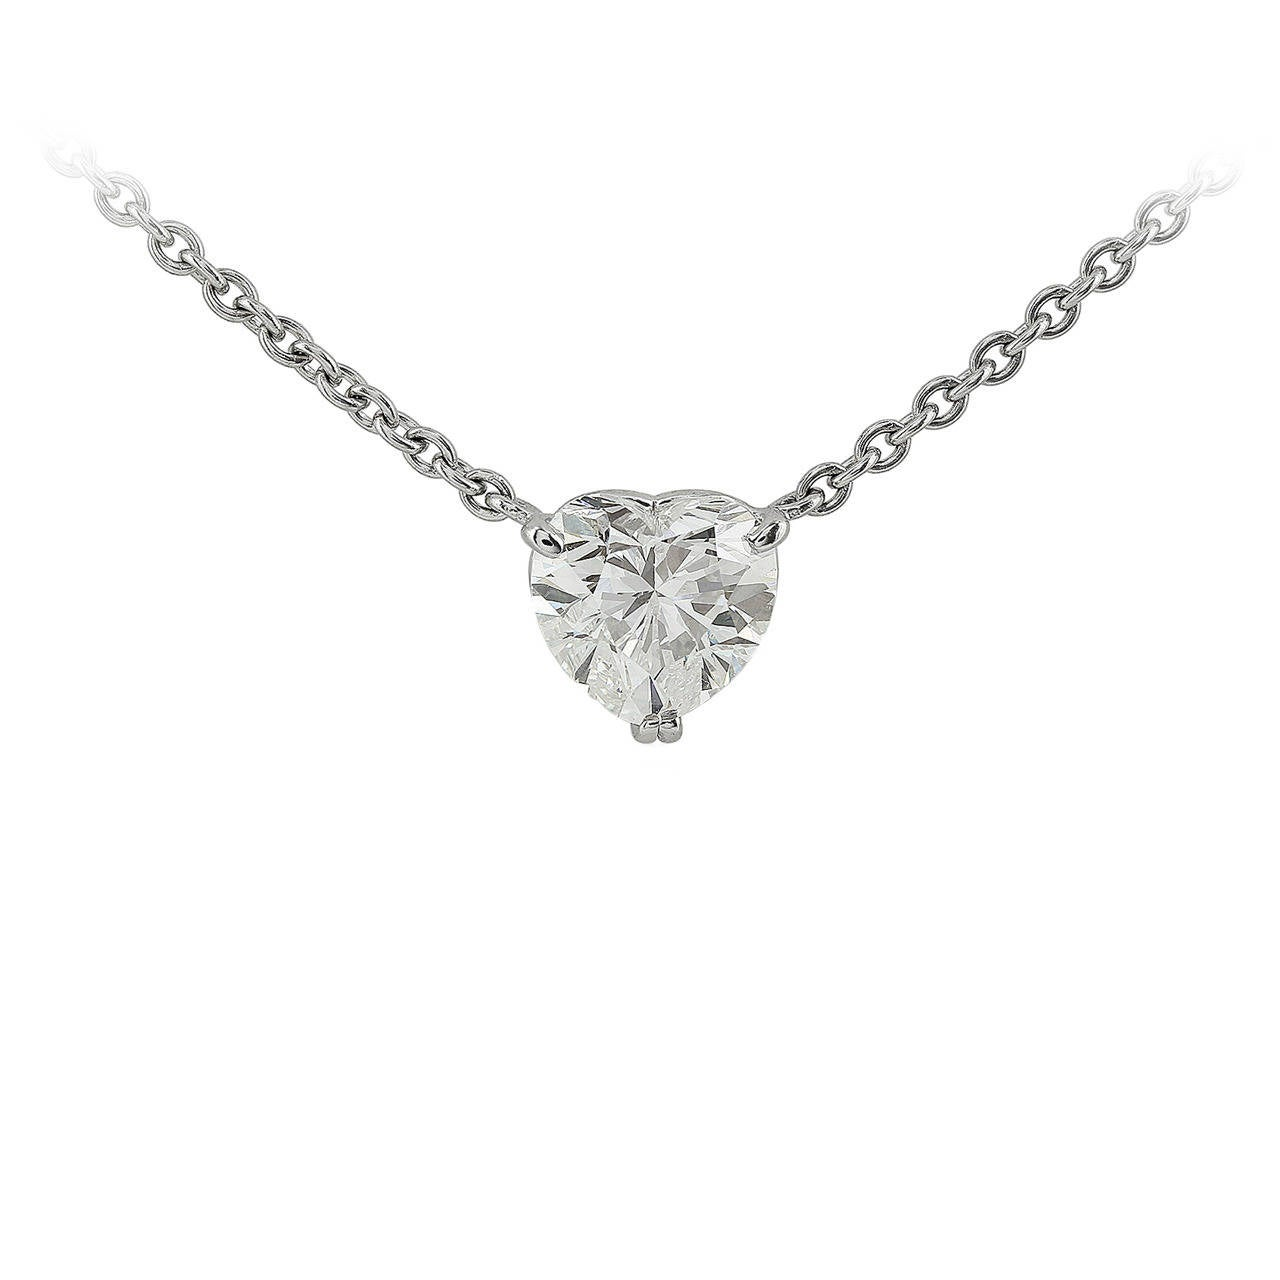 1.89 Carat Heart Diamond Platinum Pendant 1